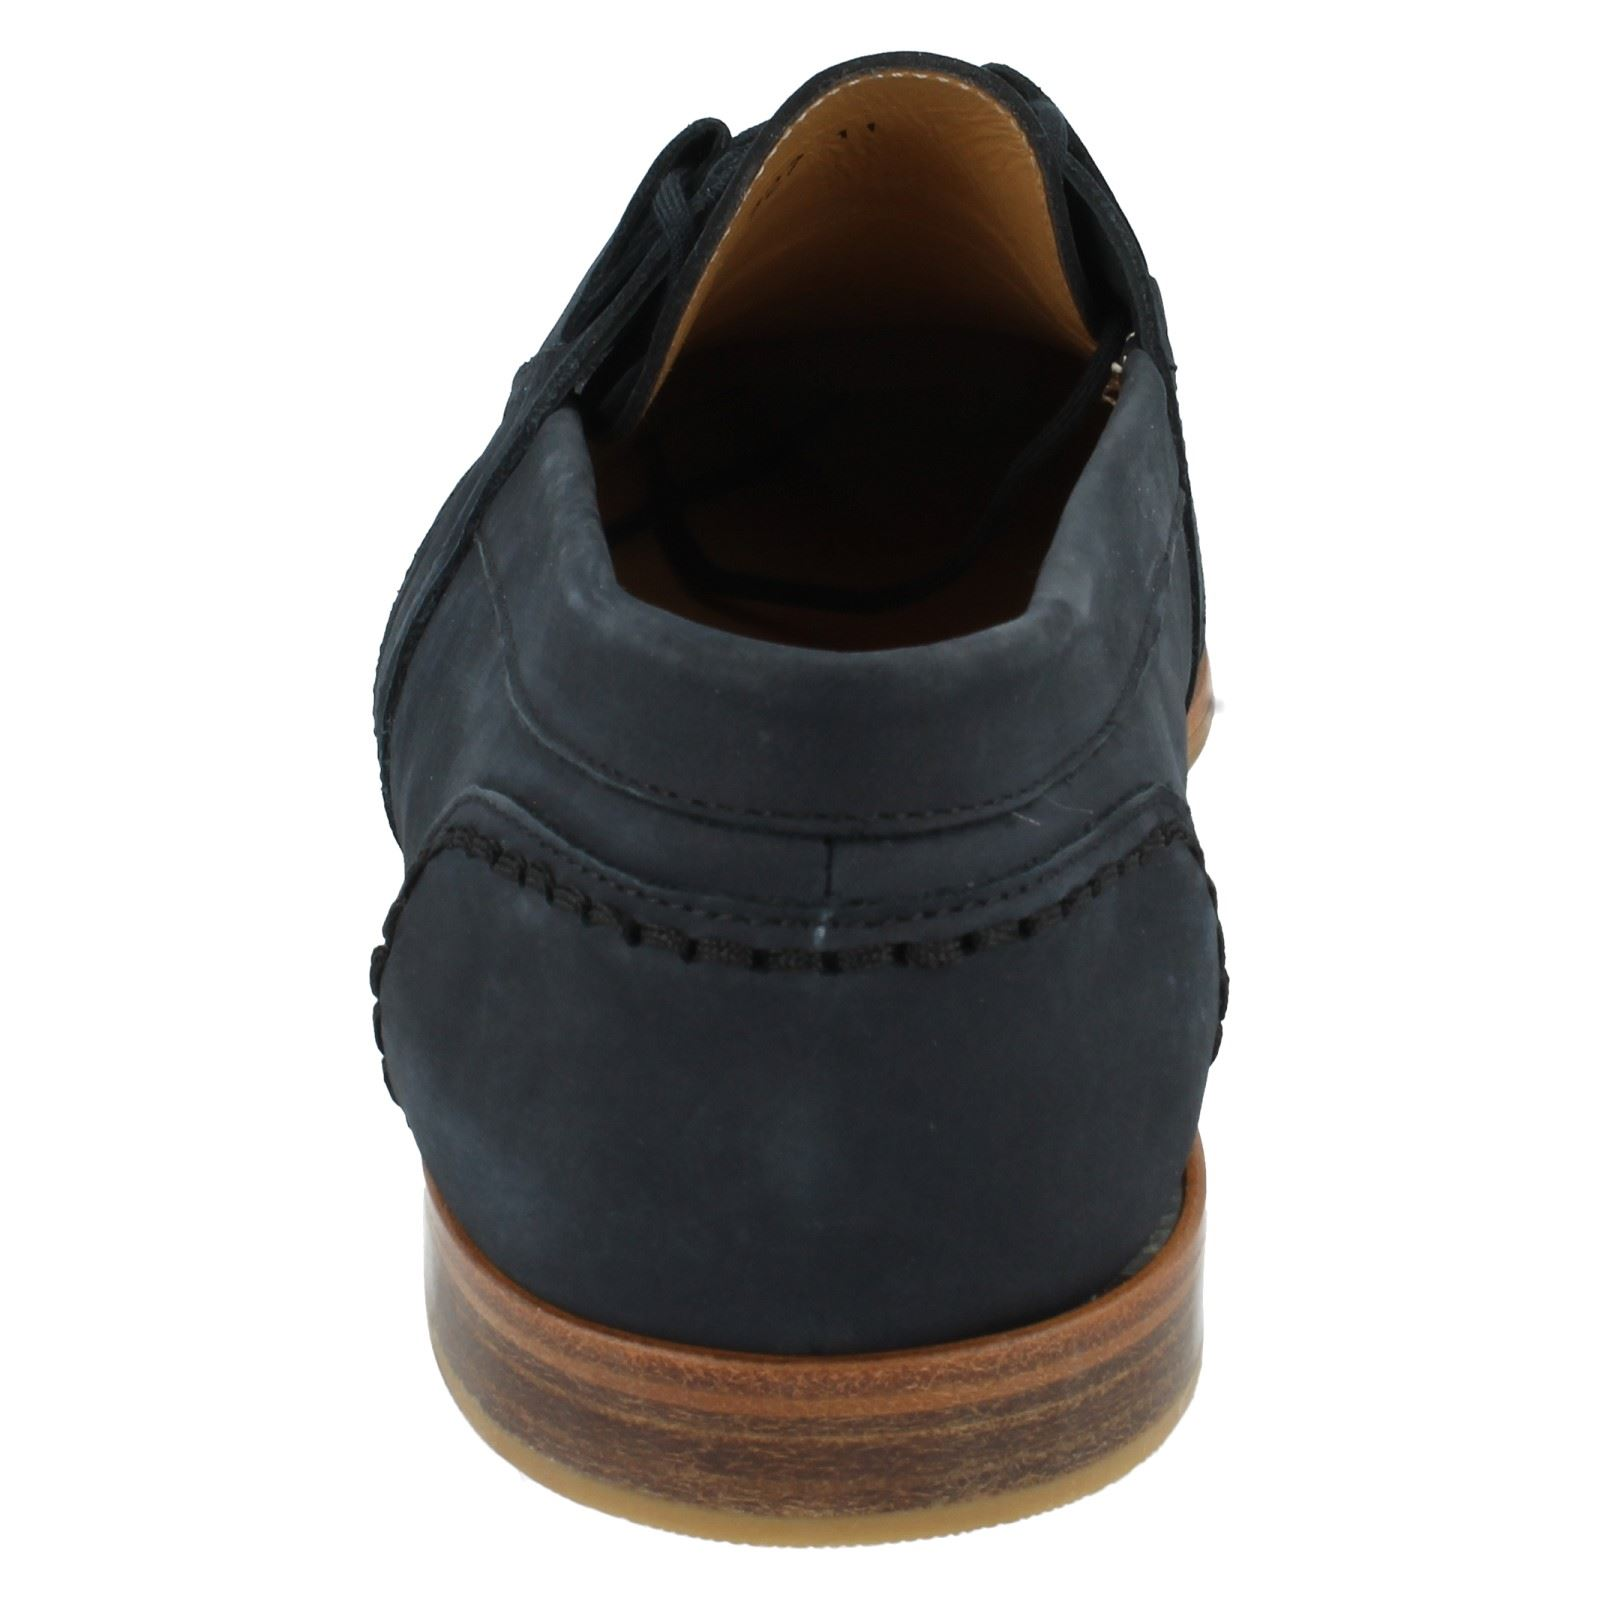 -  Herren Grenson Formal Schuhes The Style -  Swansea 9659 247093